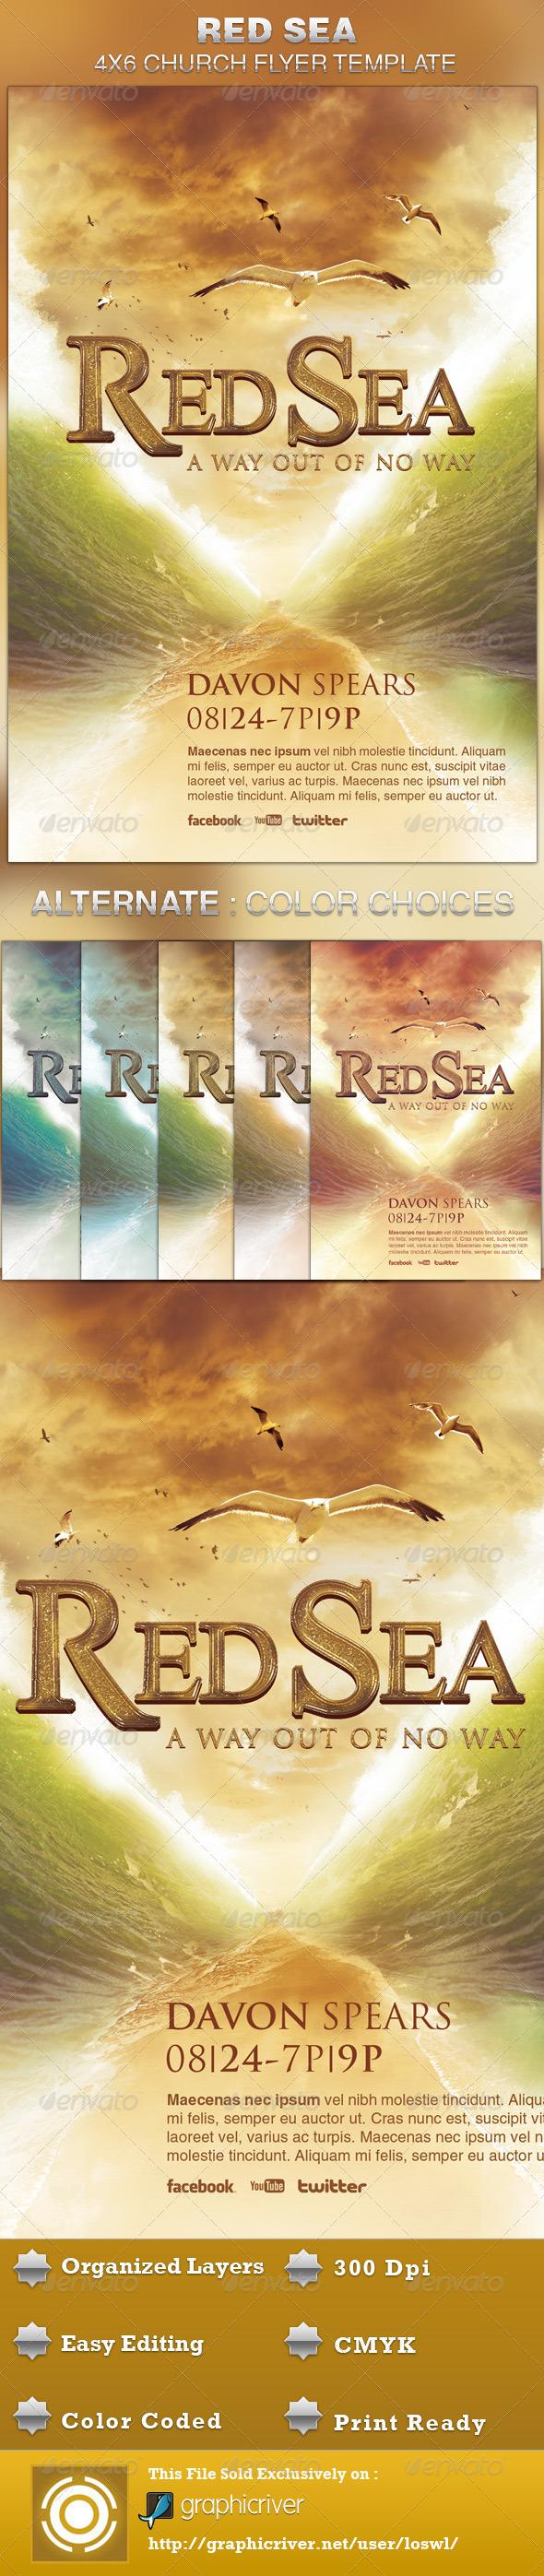 Red Sea Church Flyer Template - Church Flyers